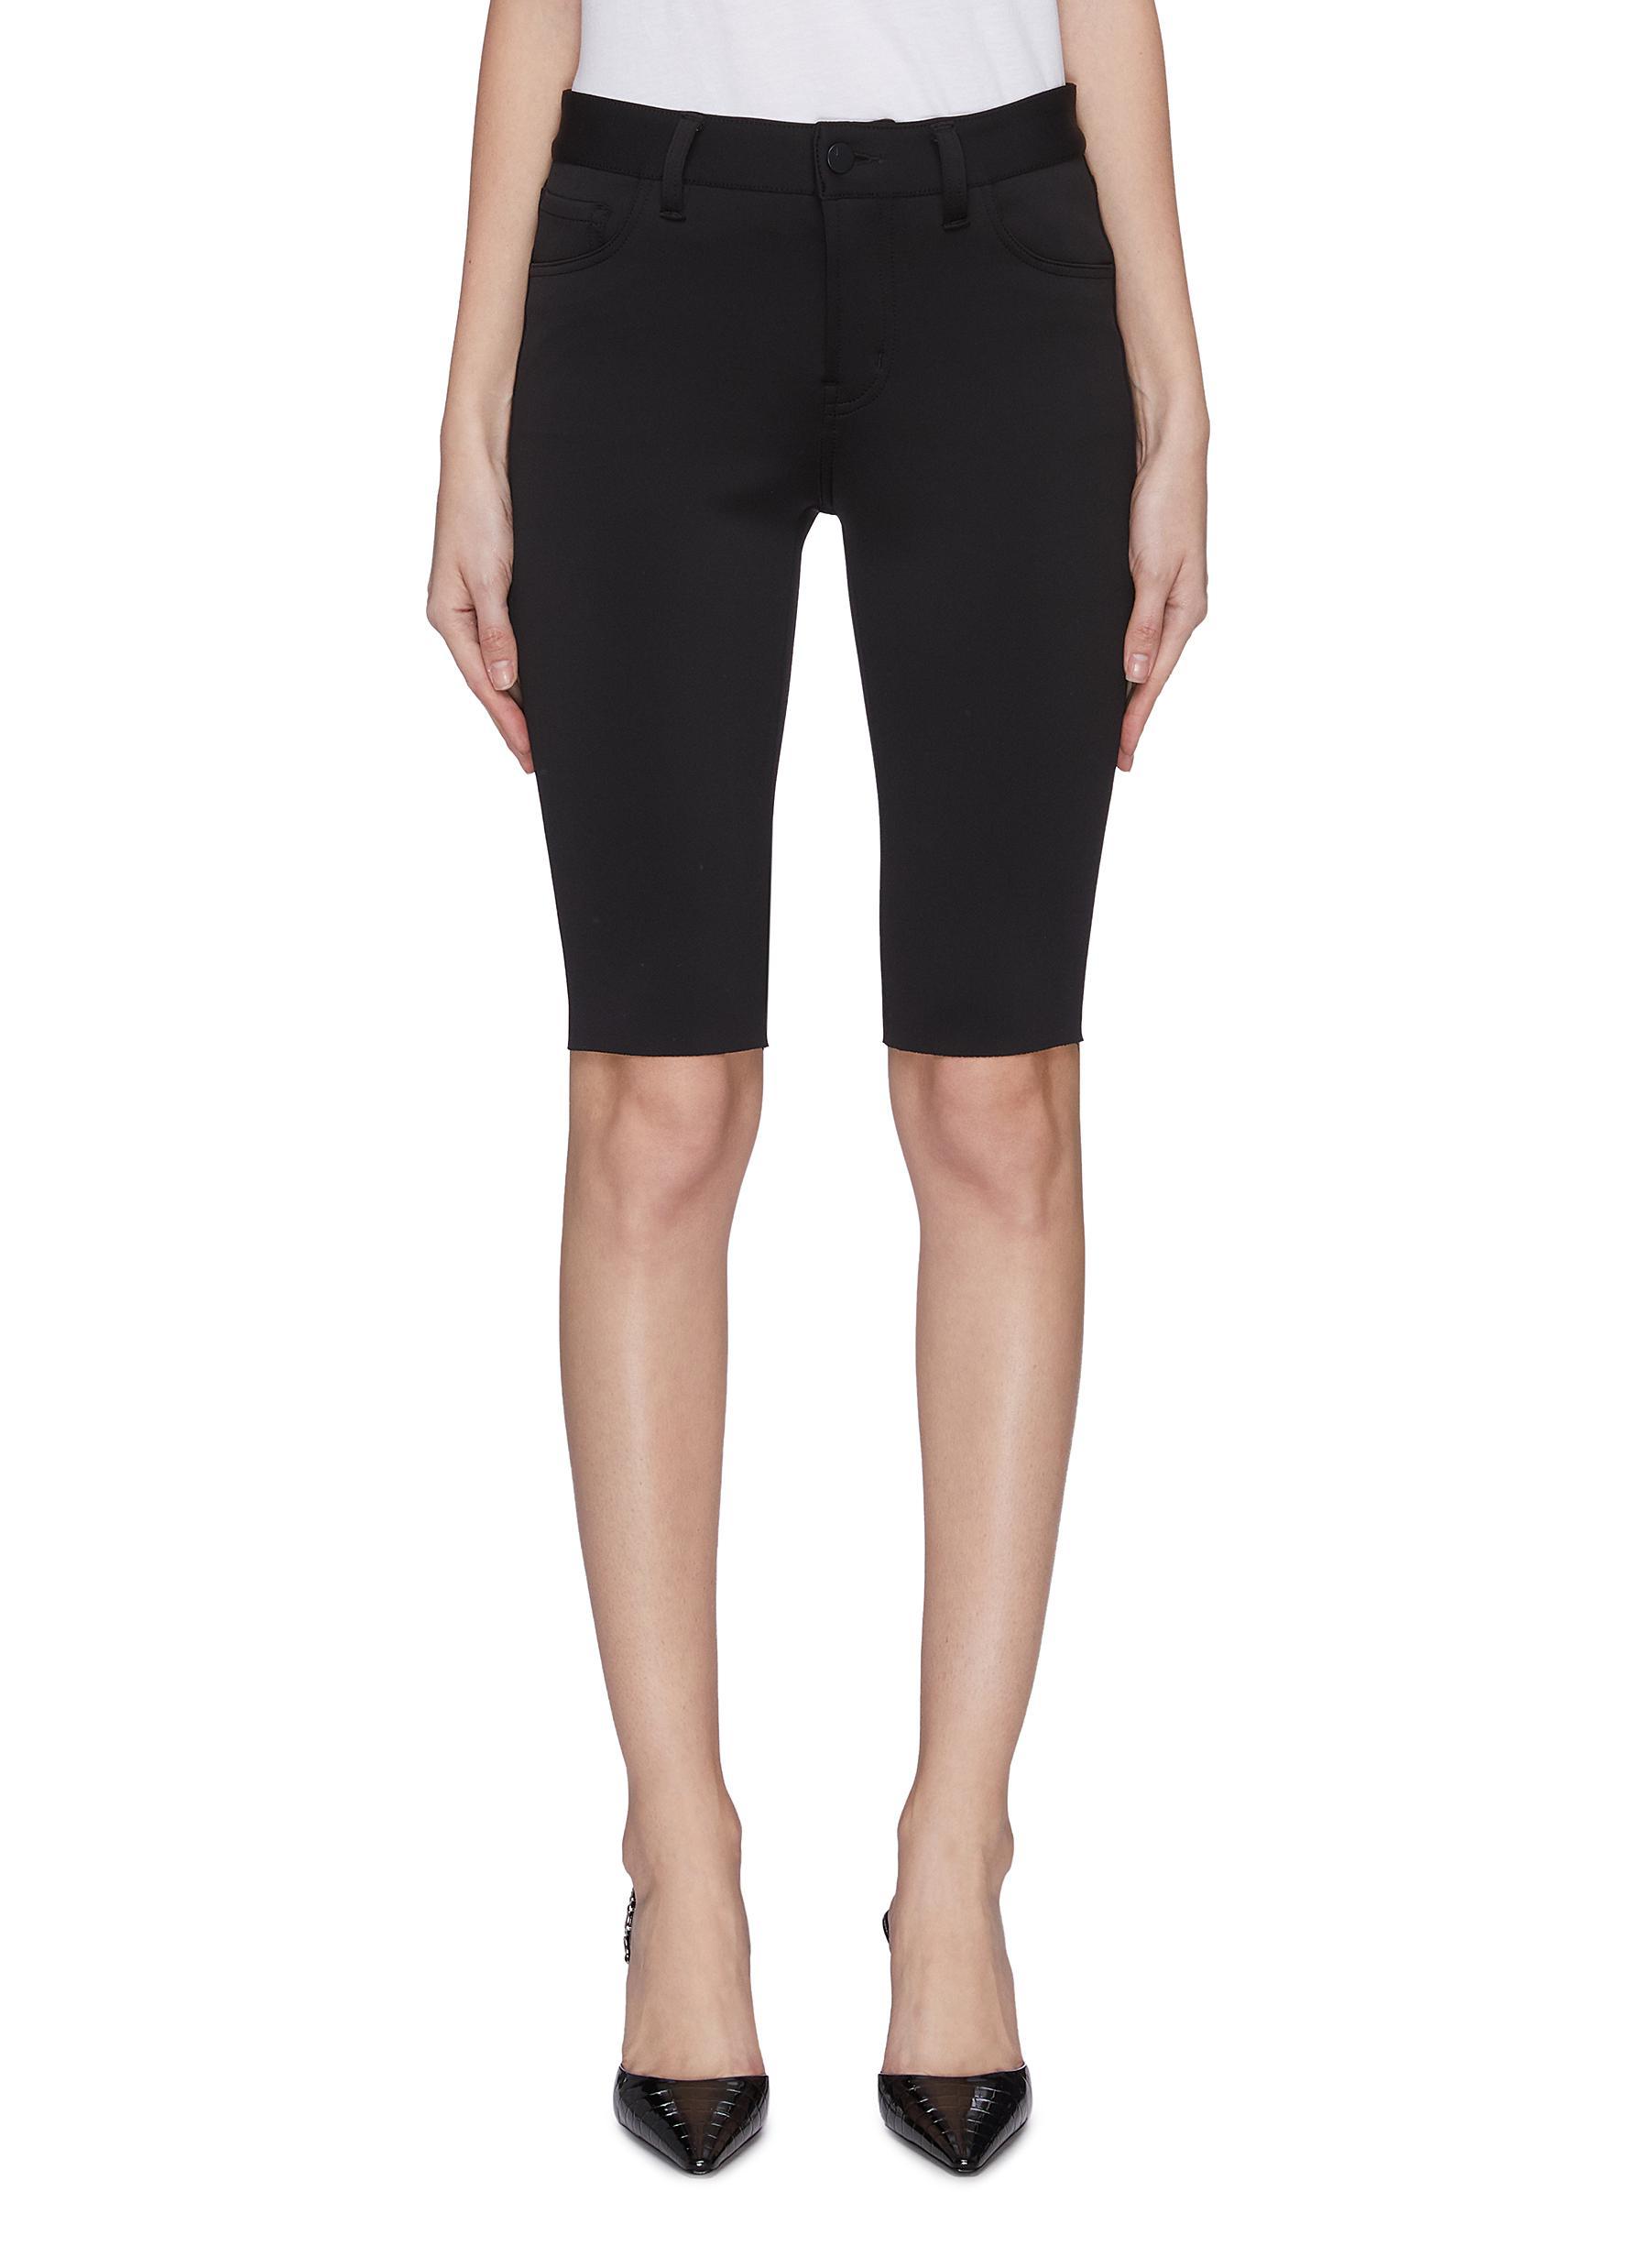 Buy J Brand Pants & Shorts 'Bermuda' scuba shorts